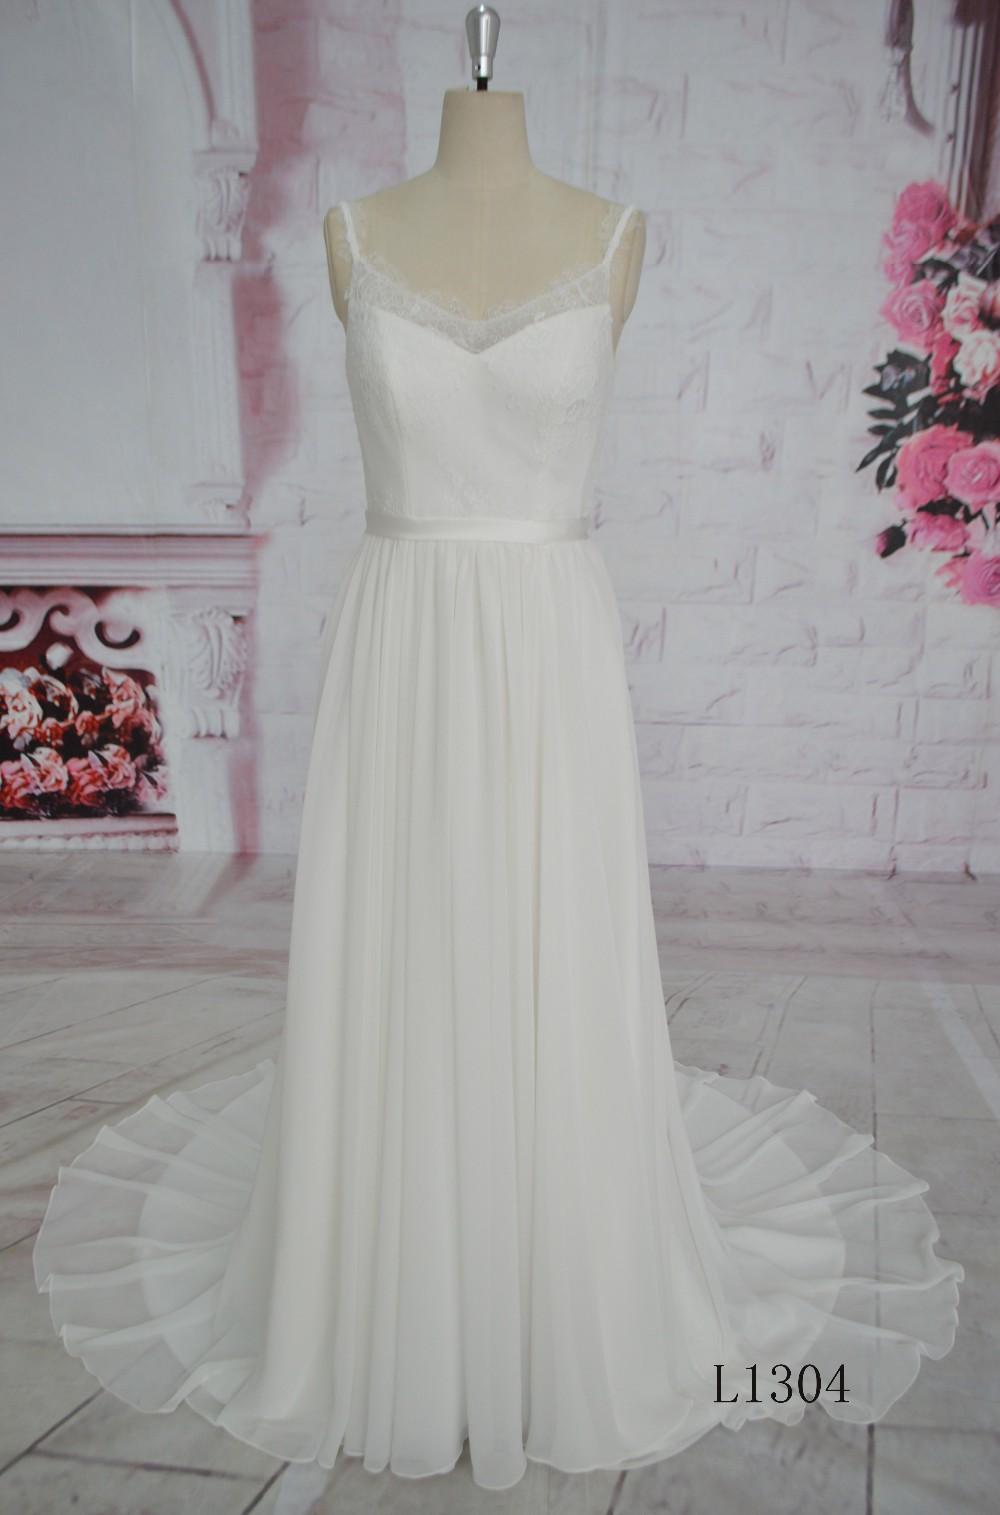 Bohemian Wedding Dress Chiffon Greek Goddess Garden Beach Bridal Gowns Buy Wedding Gowns Bridal Dress Bridal Gown Product On Alibaba Com,Plus Size Older Bride Wedding Dresses